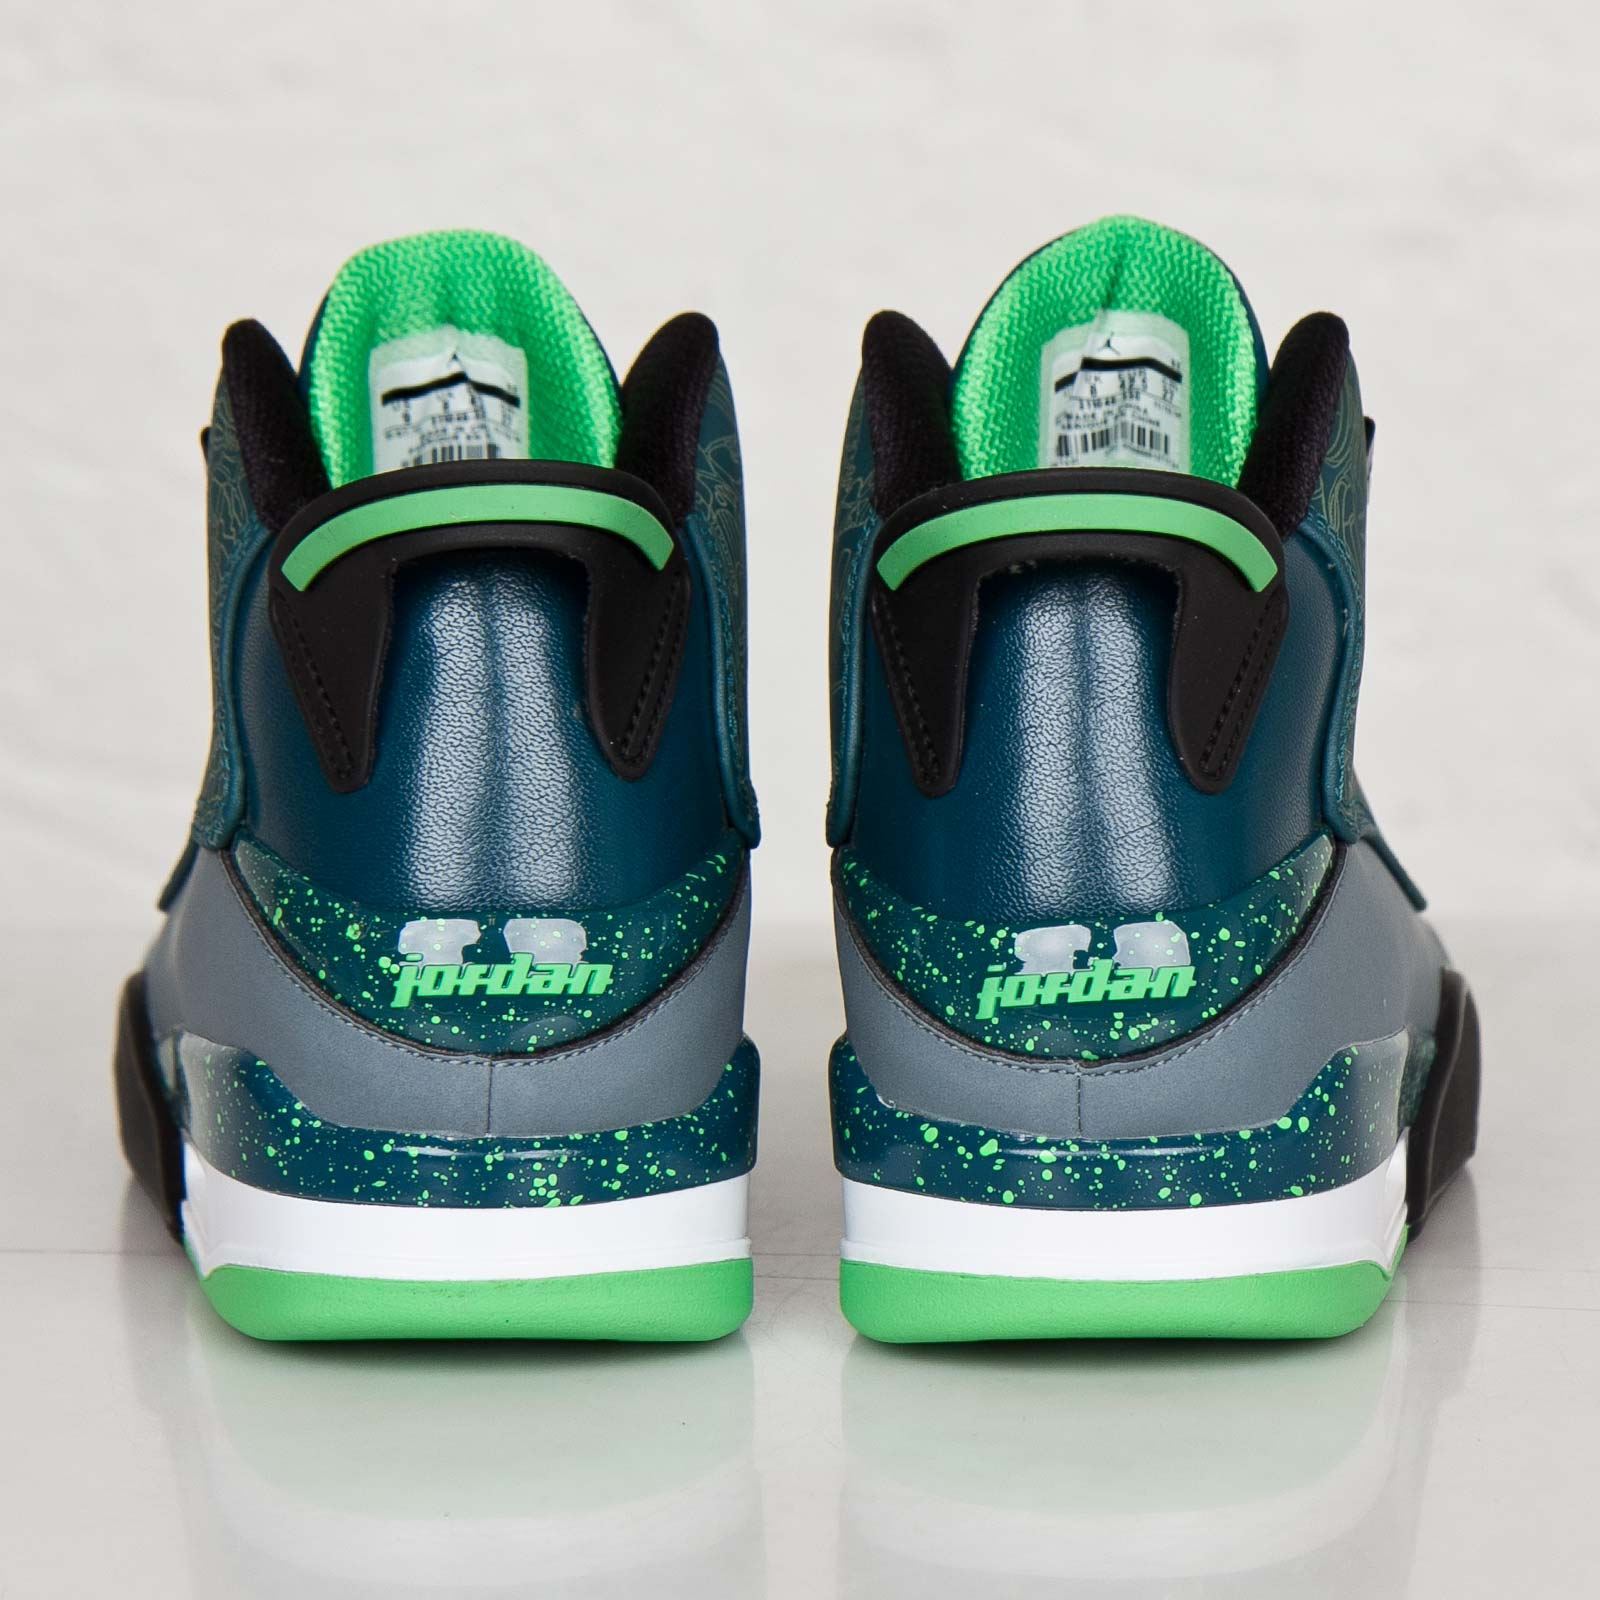 b34a4d079578f1 Jordan Brand Air Jordan Dub Zero - 311046-330 - Sneakersnstuff ...